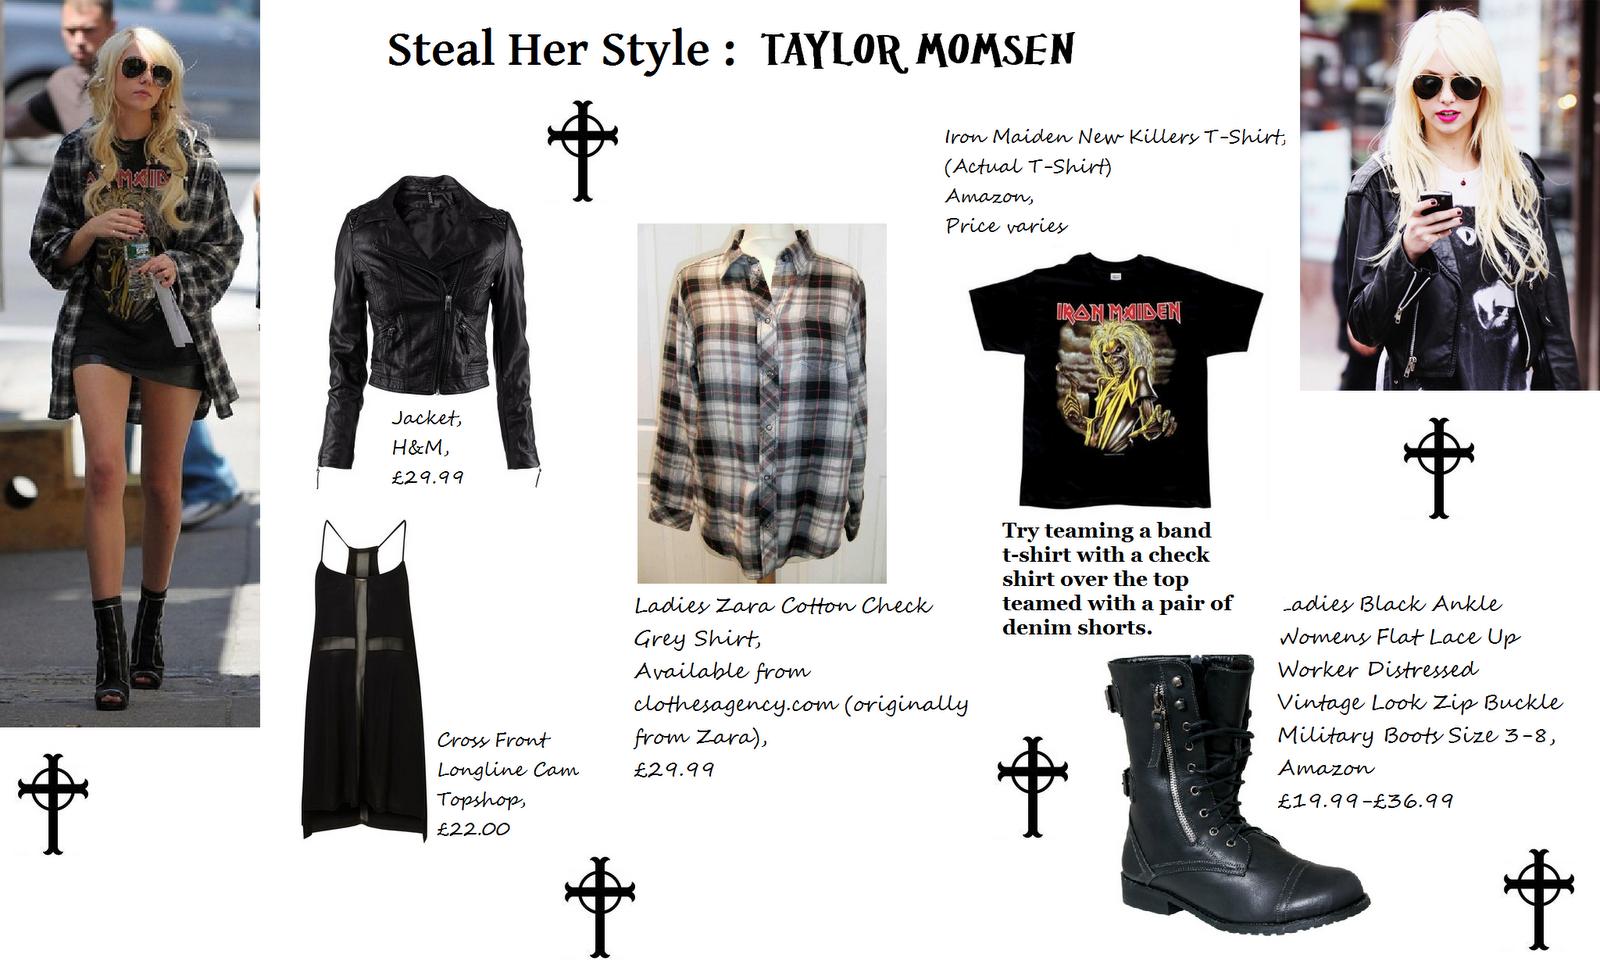 http://4.bp.blogspot.com/-dmizwXdcfag/T5_tFxyUPbI/AAAAAAAAAb4/pvR6Id-26Uo/s1600/Steal+Her+Style+Taylor+Momsen.png